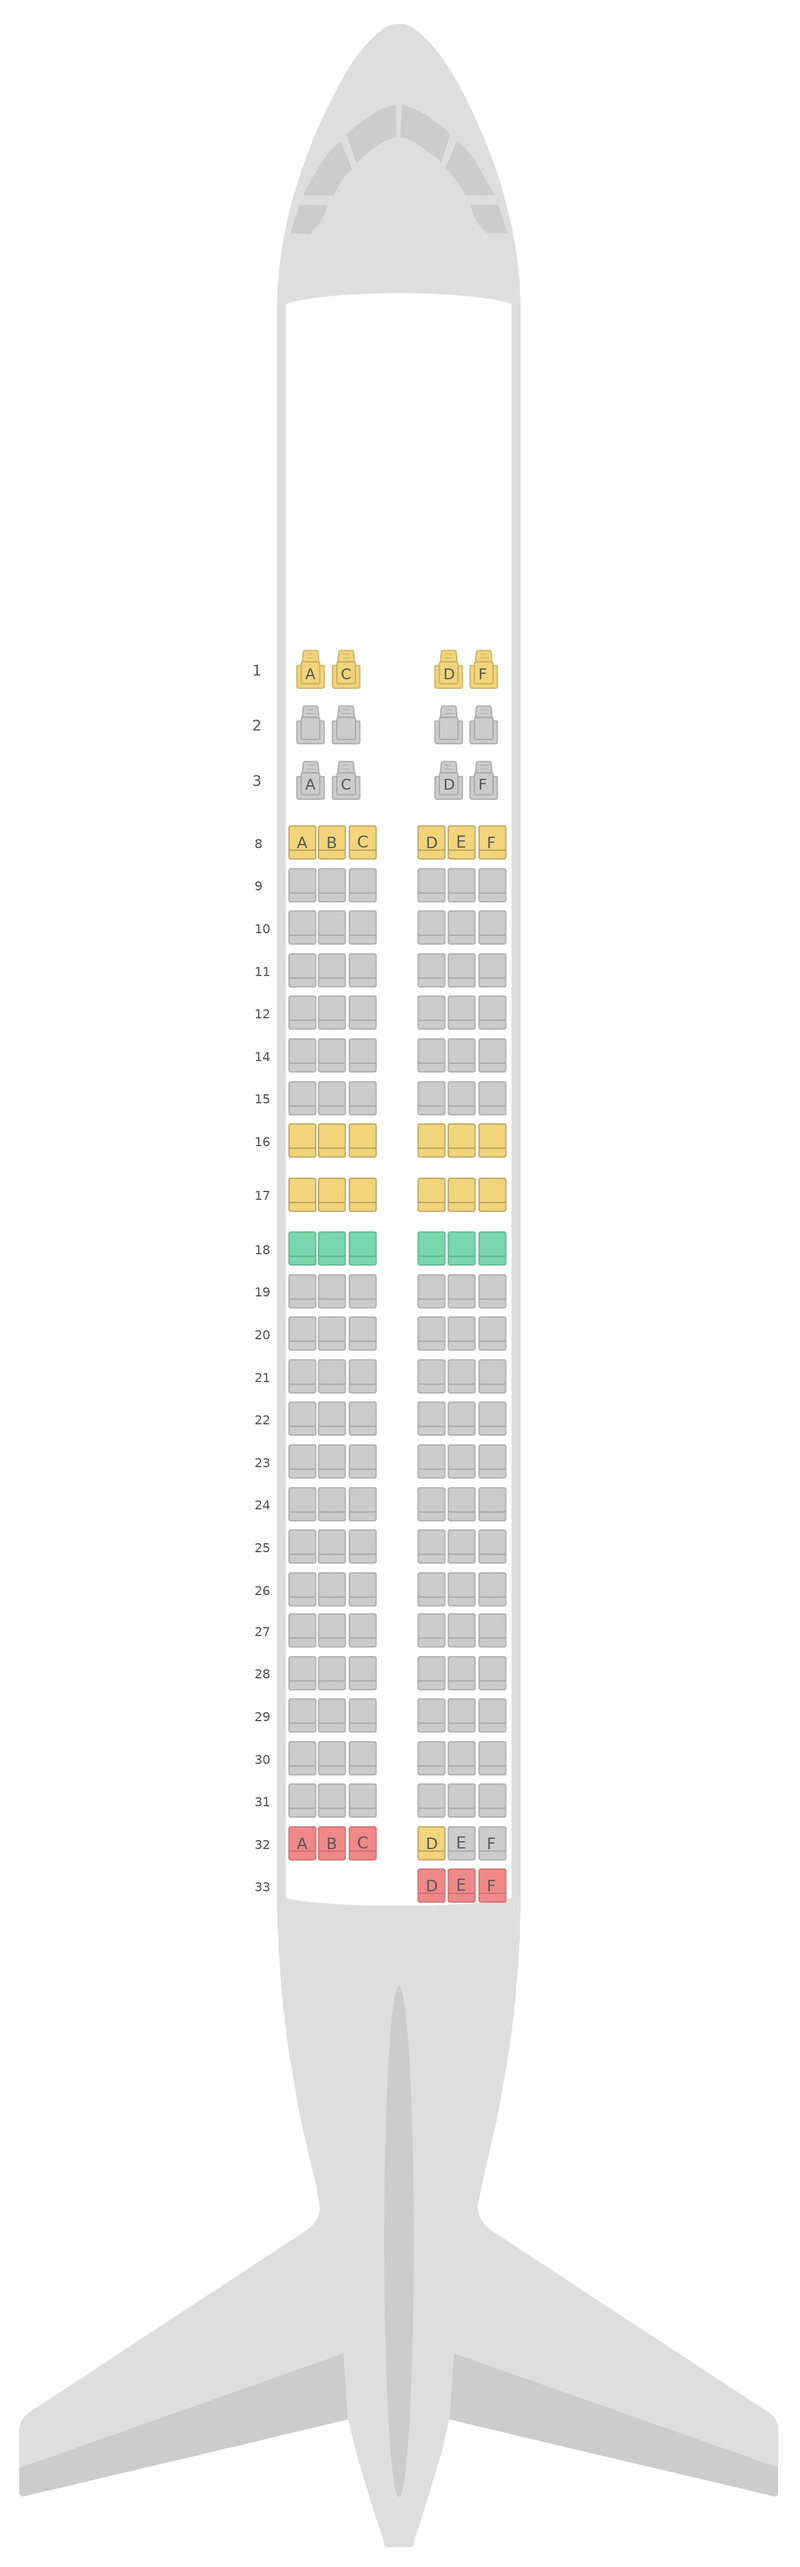 Seat Map Royal Air Maroc Boeing 737-800 (738)